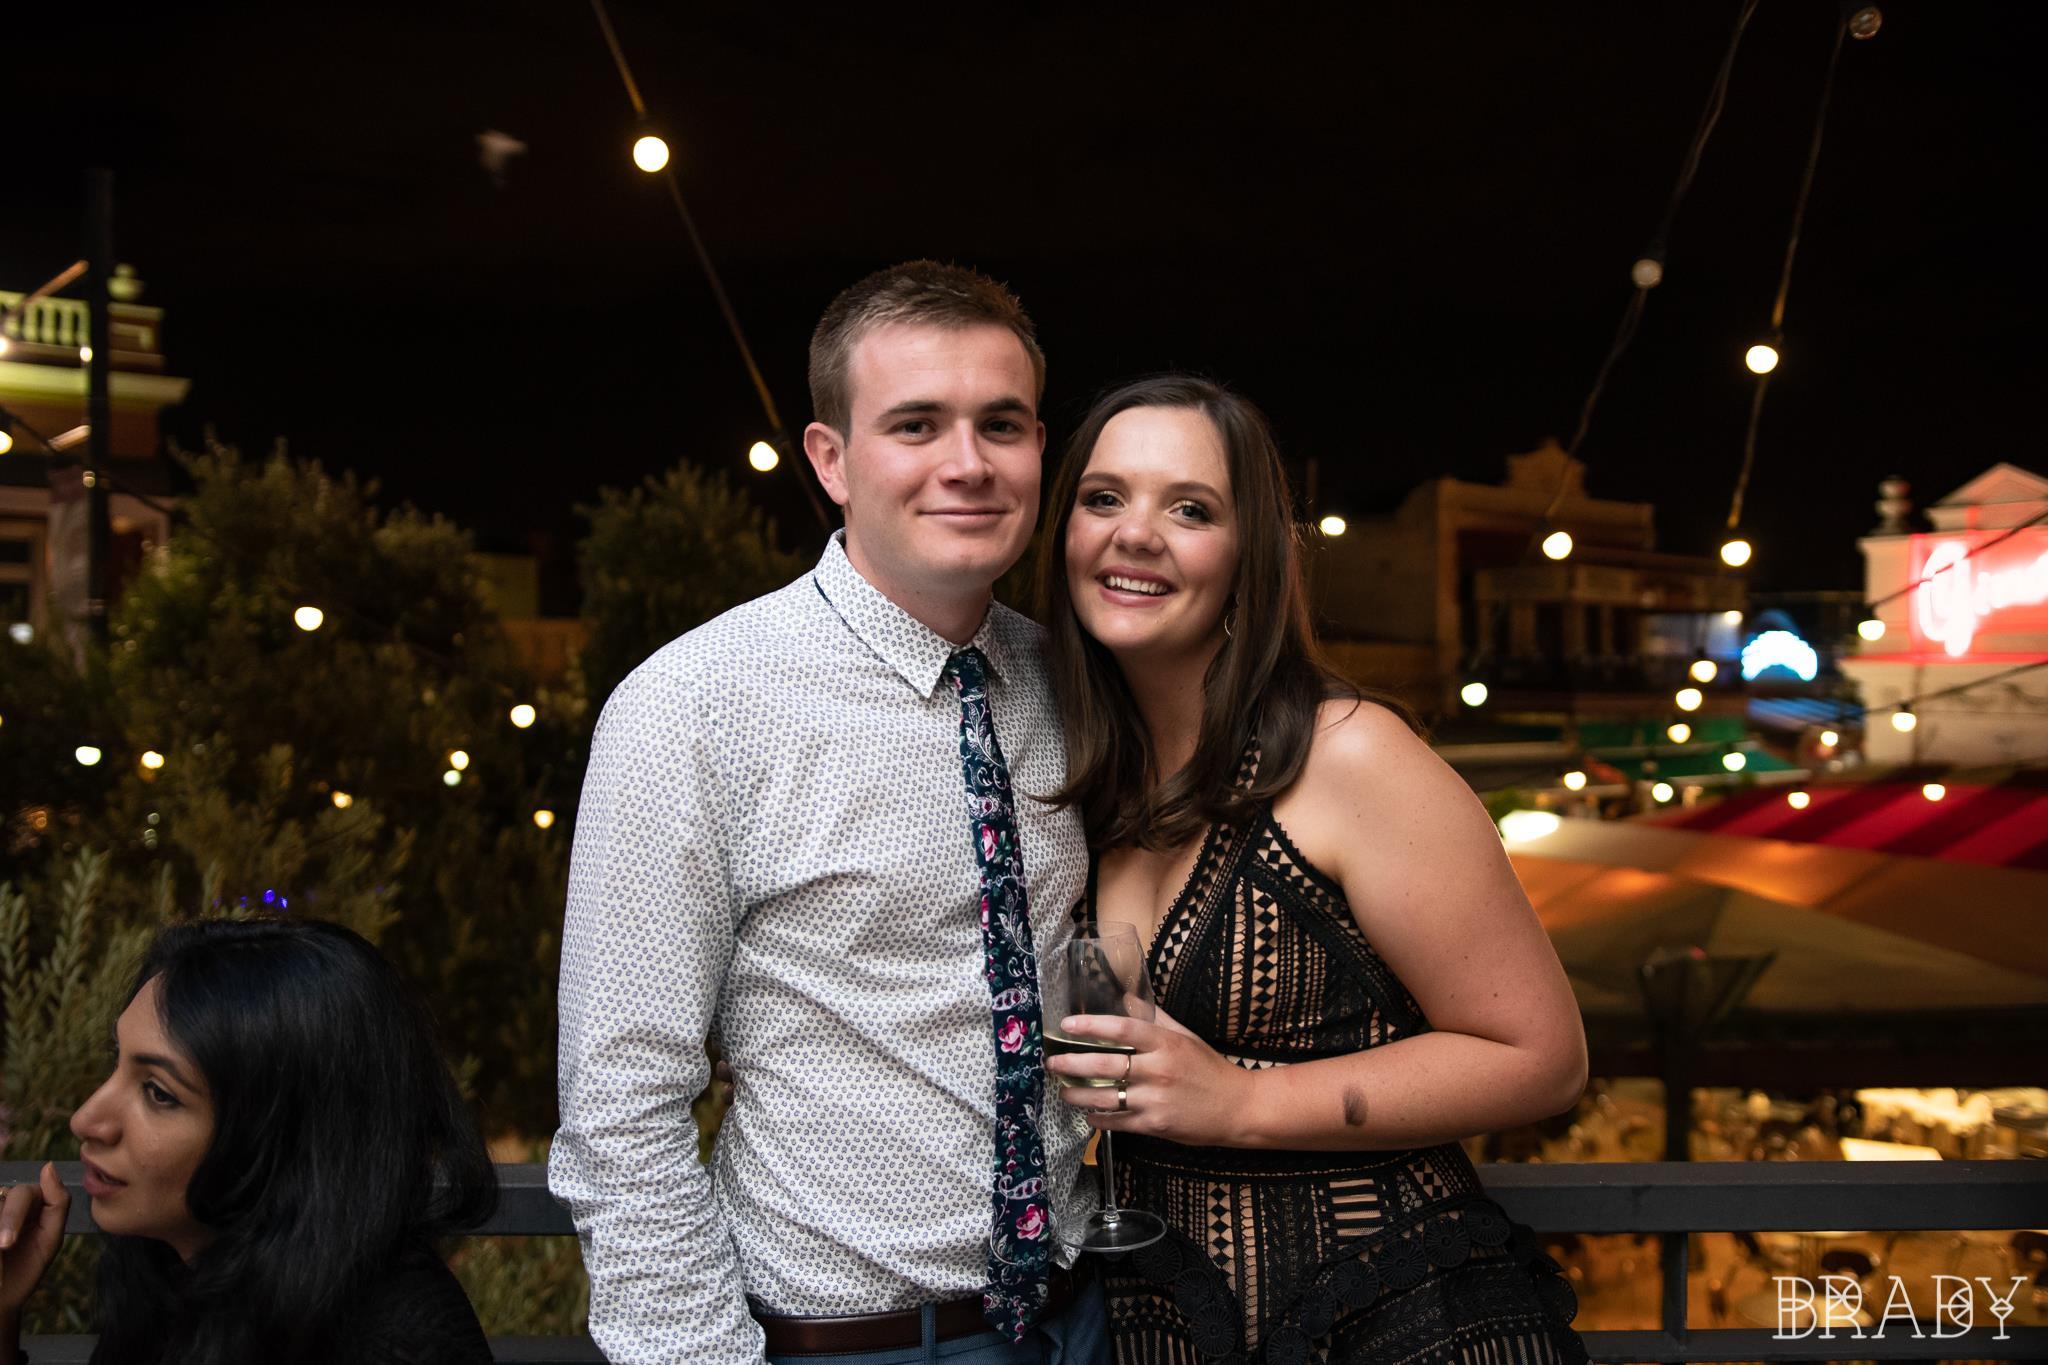 Cottesloe wedding reception venues